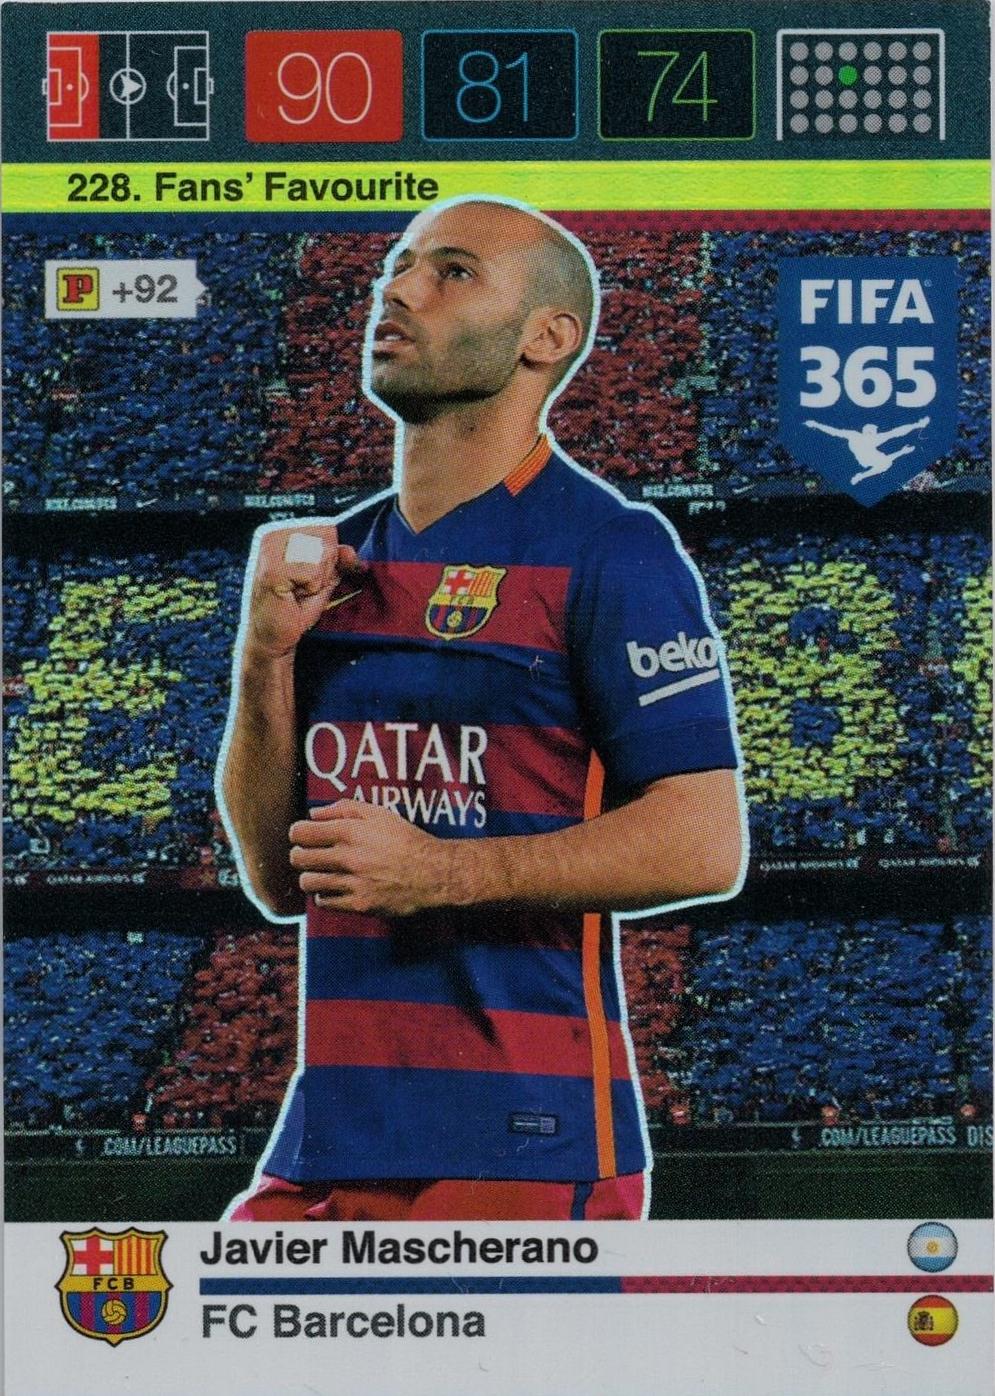 Fifa 365 Adrenalyn XL-nº 267 Giacomo Bonaventura-dínamo